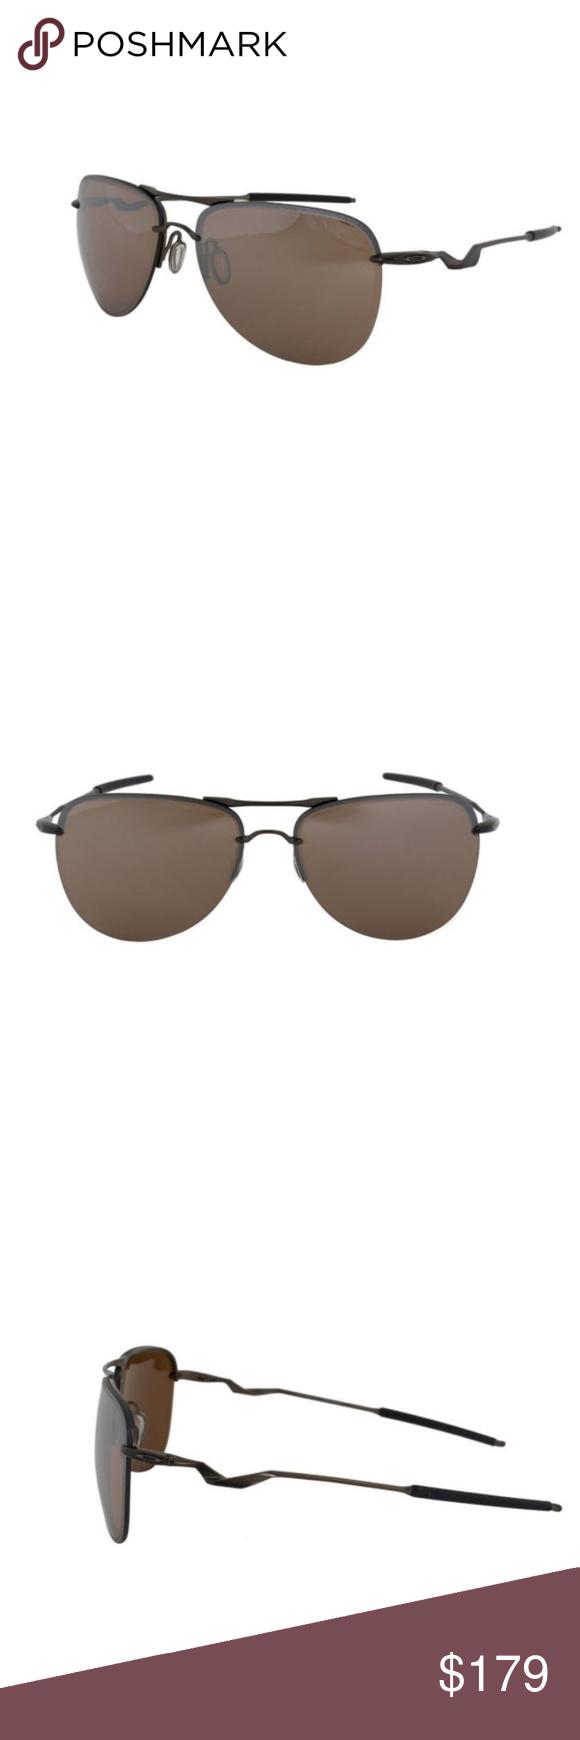 30447888b2 Oakley Tailpin Tungsten Iridium Pewter Sunglasses NWT